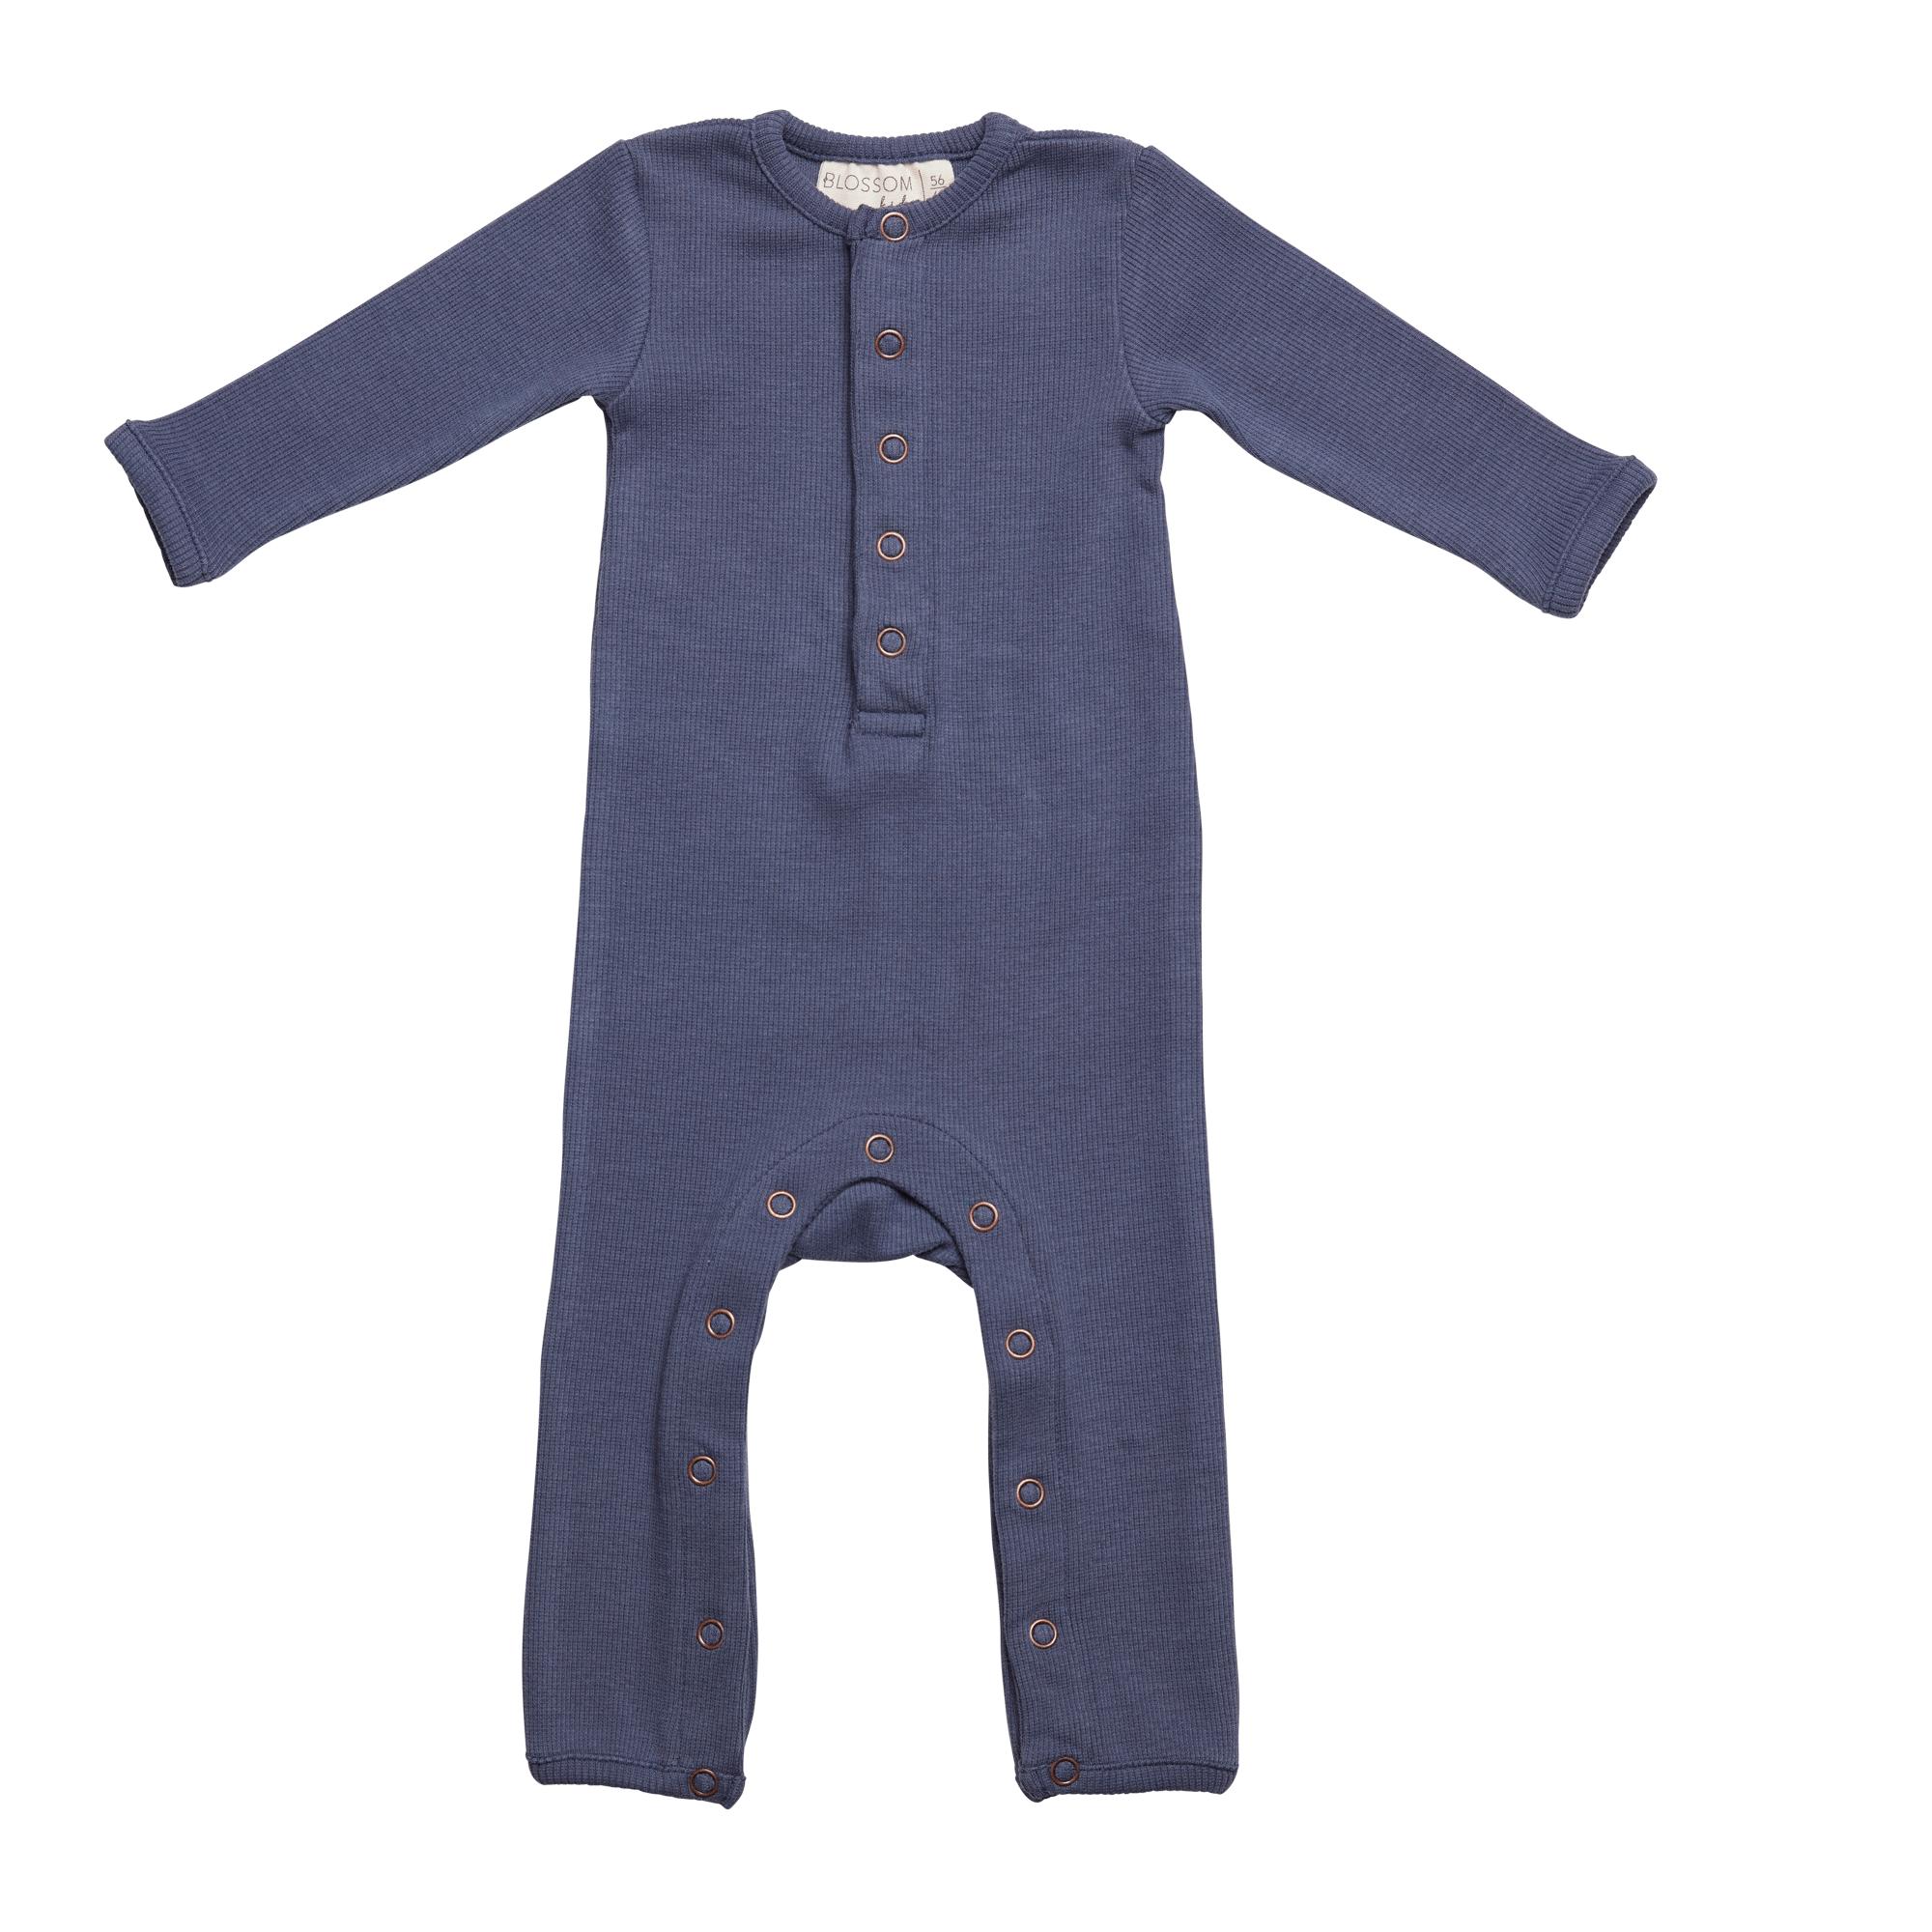 Baby jumpsuit - Dusty Blue-1